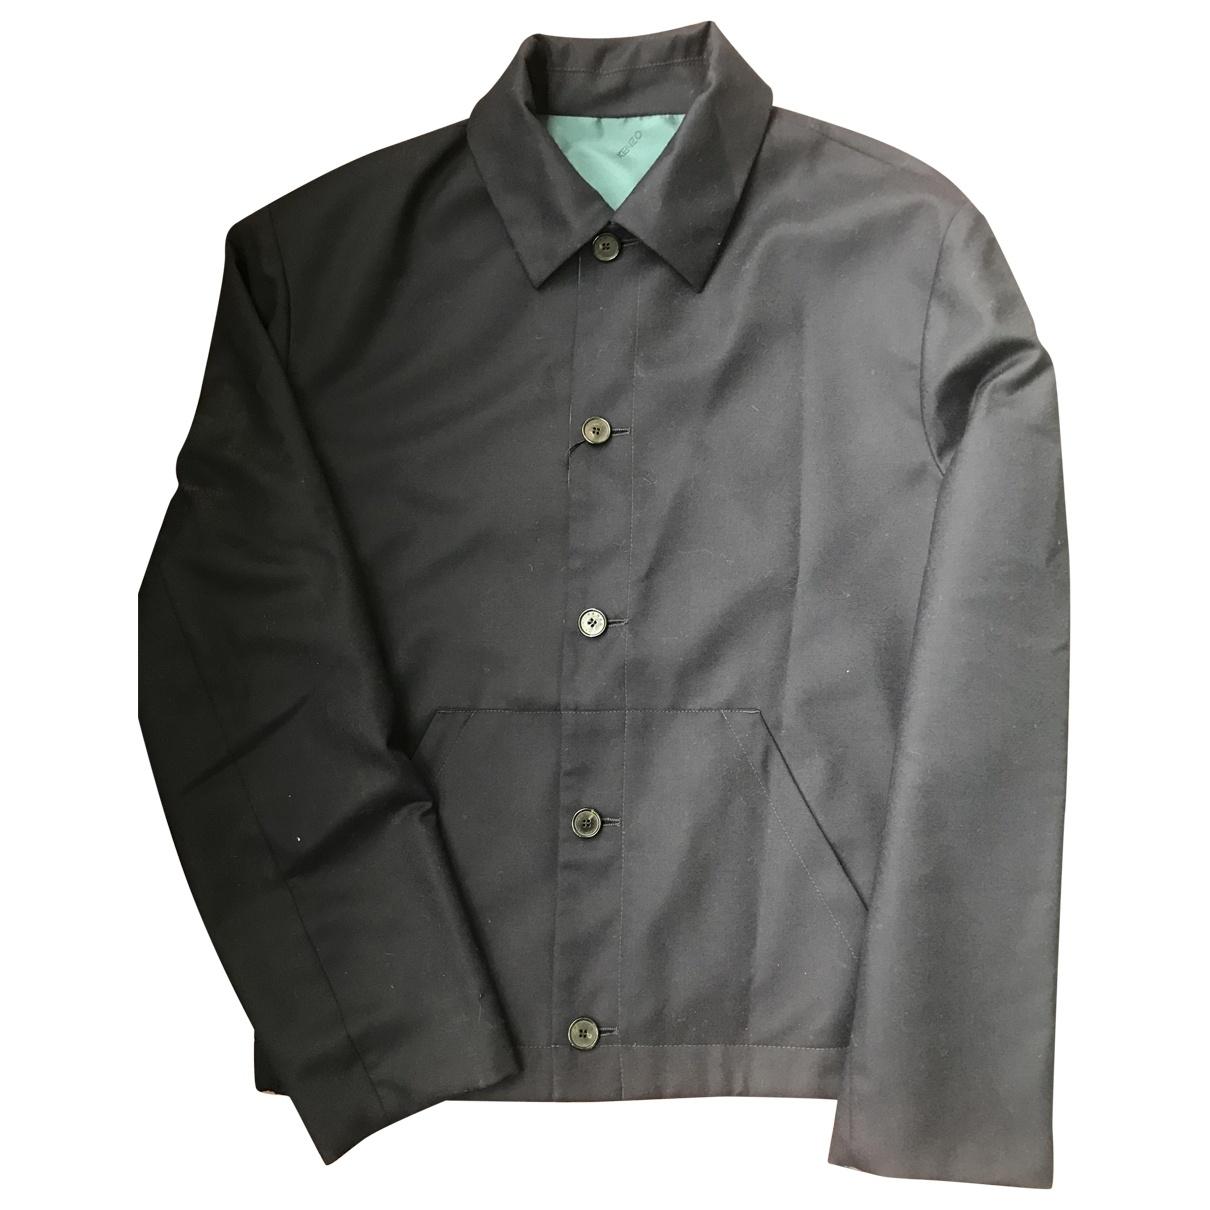 Kenzo \N Navy Wool jacket  for Men L International